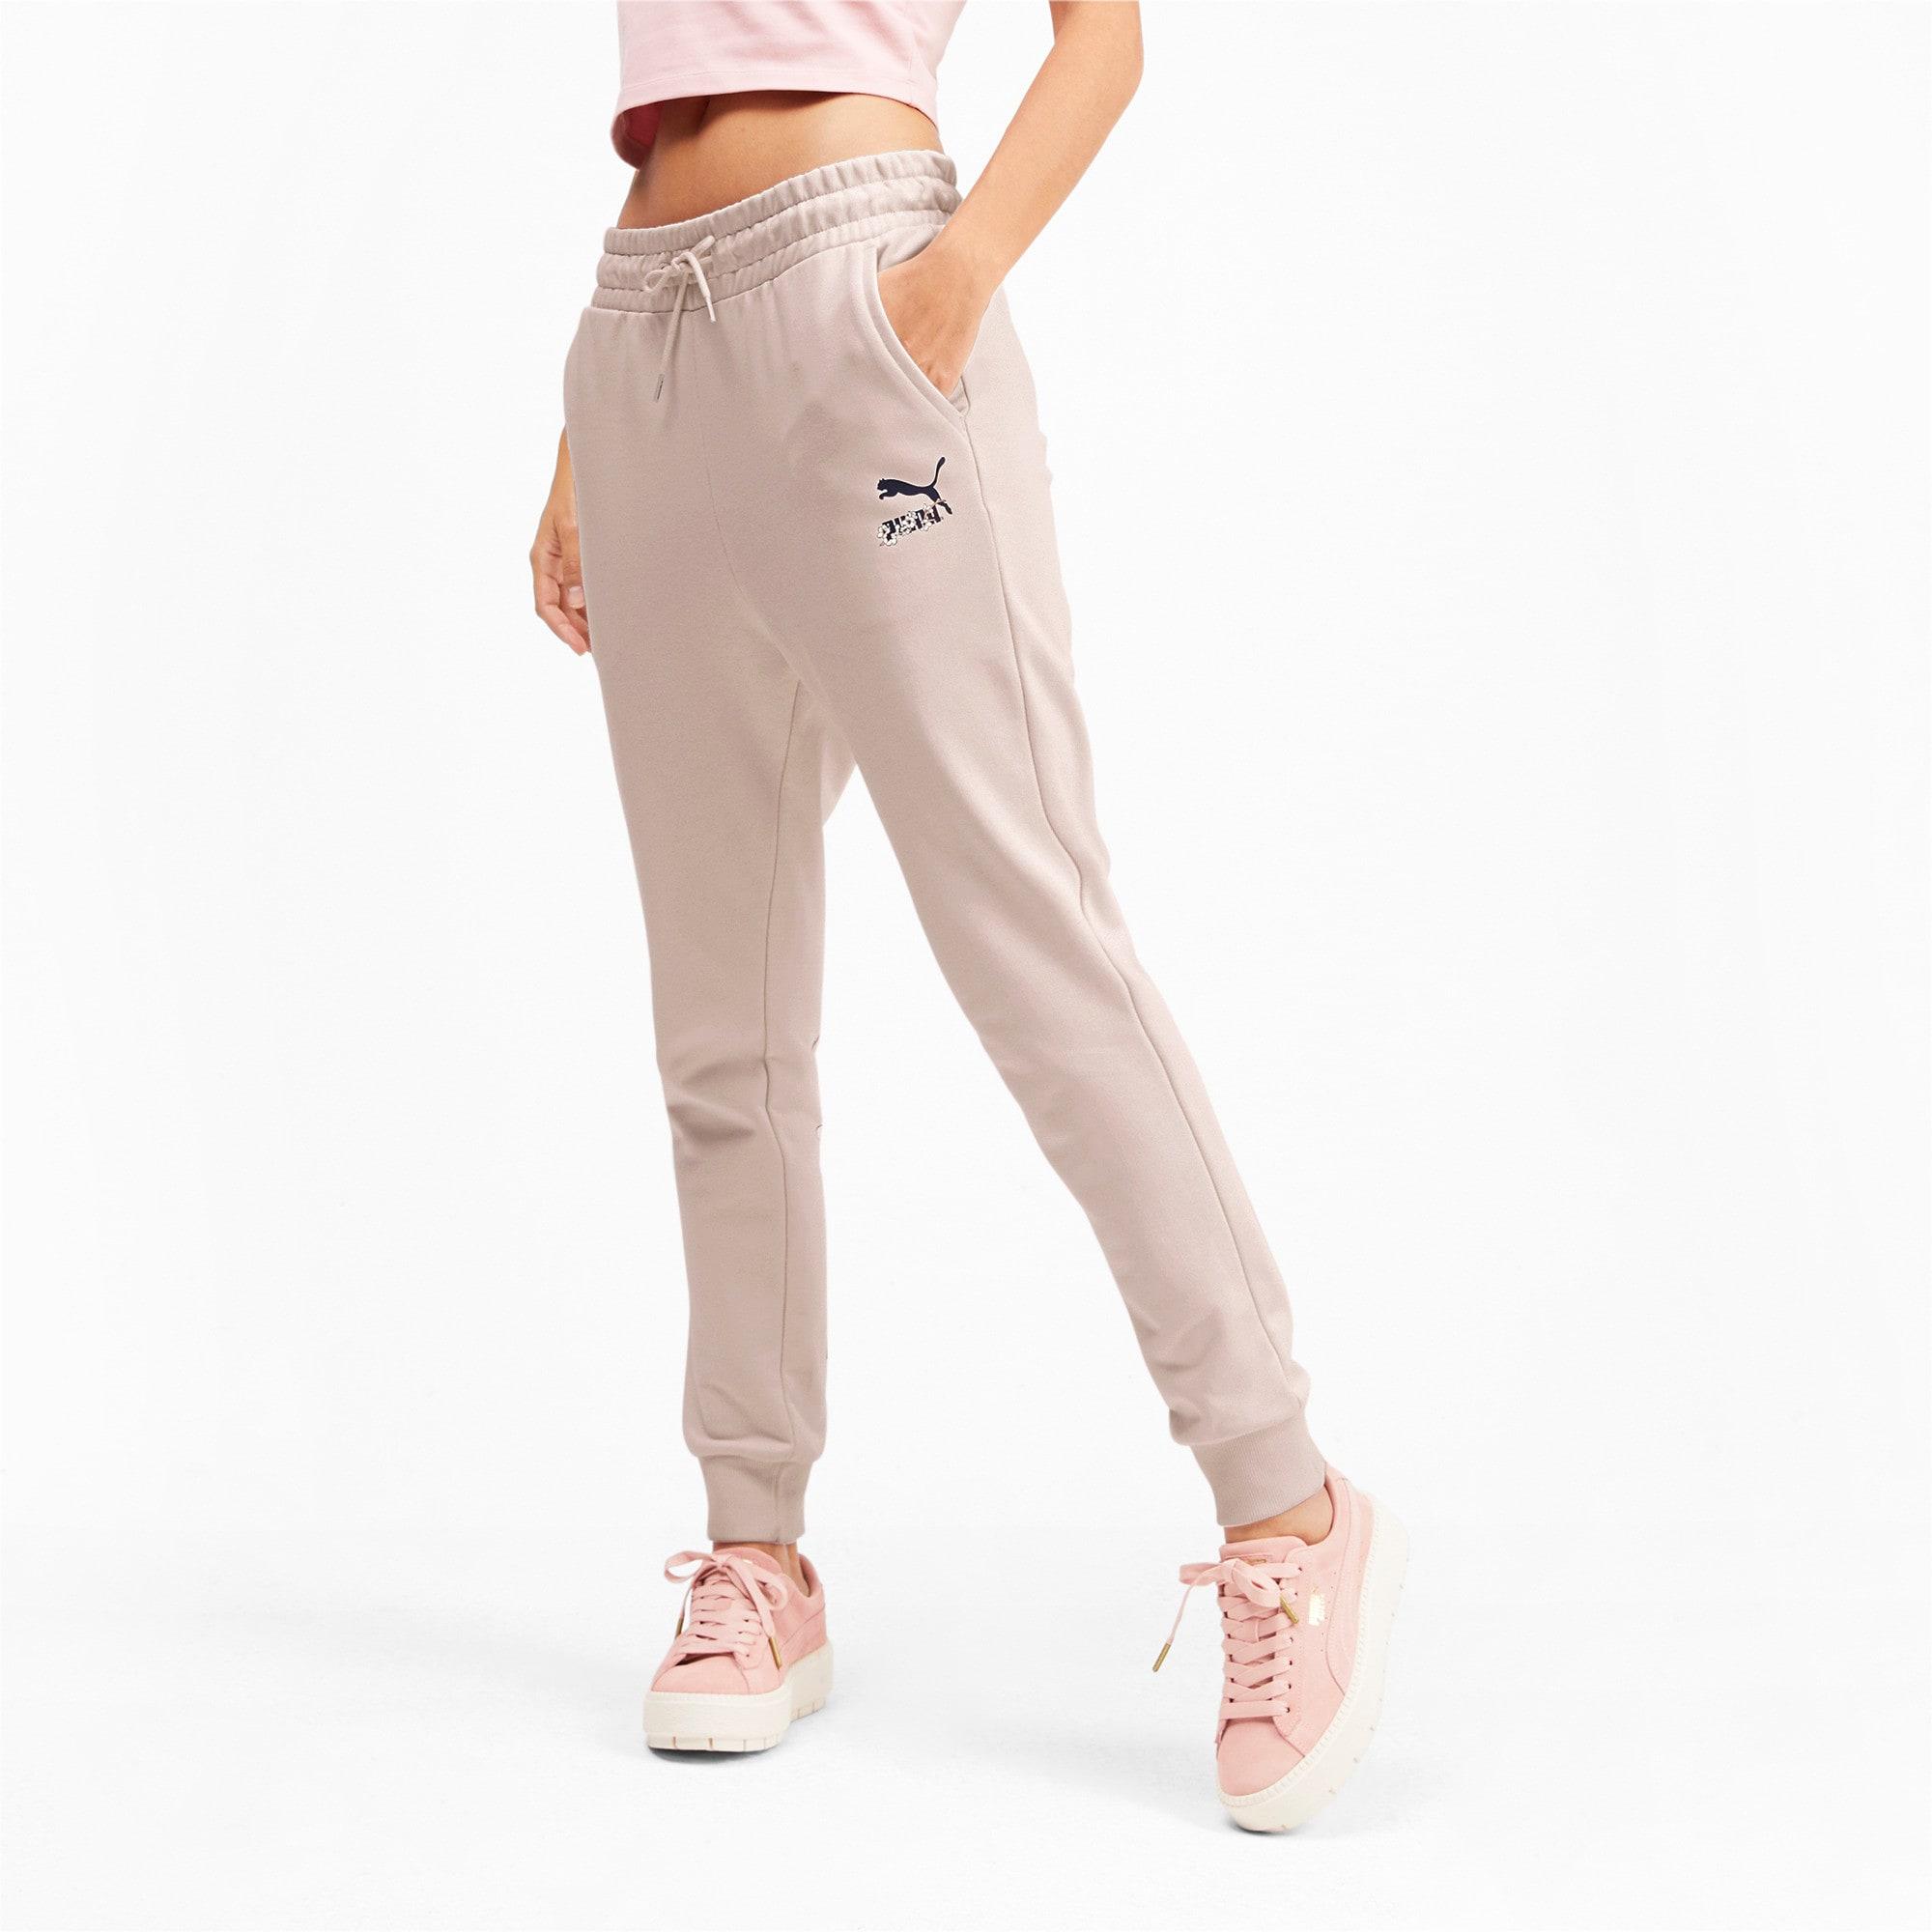 Miniatura 2 de Pantalones deportivosSakurapara mujer, Pastel Parchment, mediano